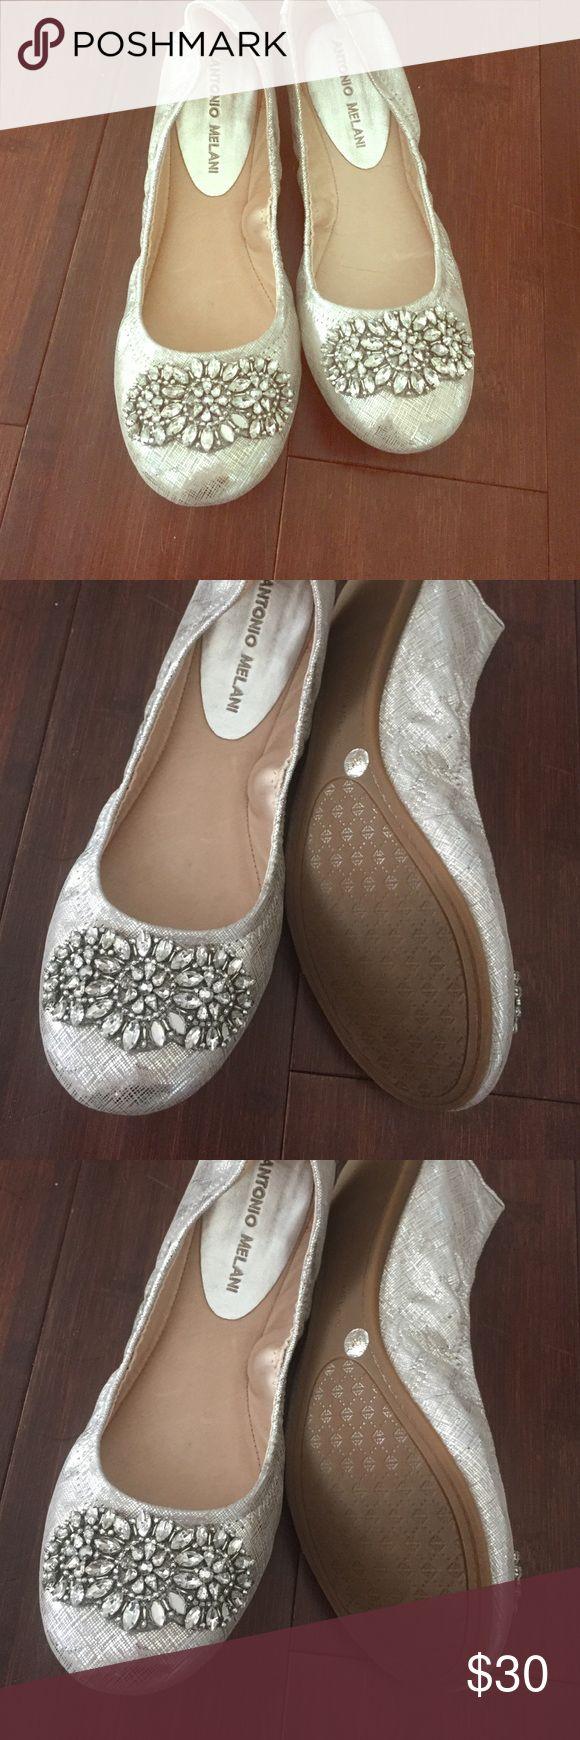 NWOT Antonio Melani ballet flats with rhinestones NWOT Antonio Melani ballet flats with rhinestones ANTONIO MELANI Shoes Flats & Loafers